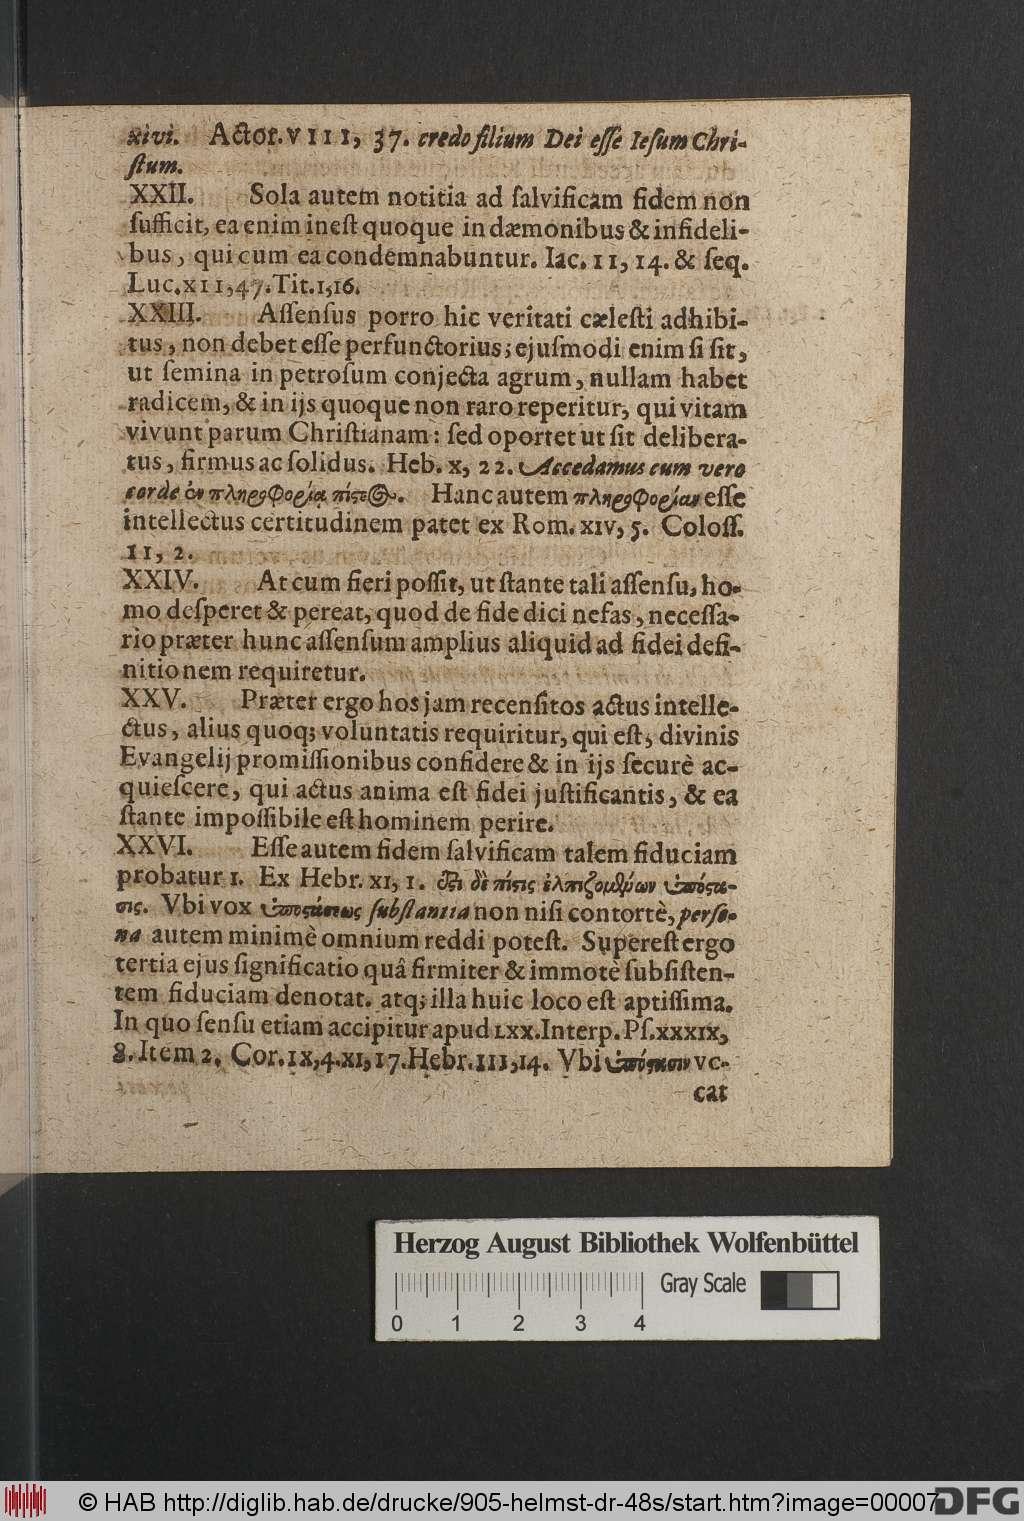 https://diglib.hab.de/drucke/905-helmst-dr-48s/00007.jpg